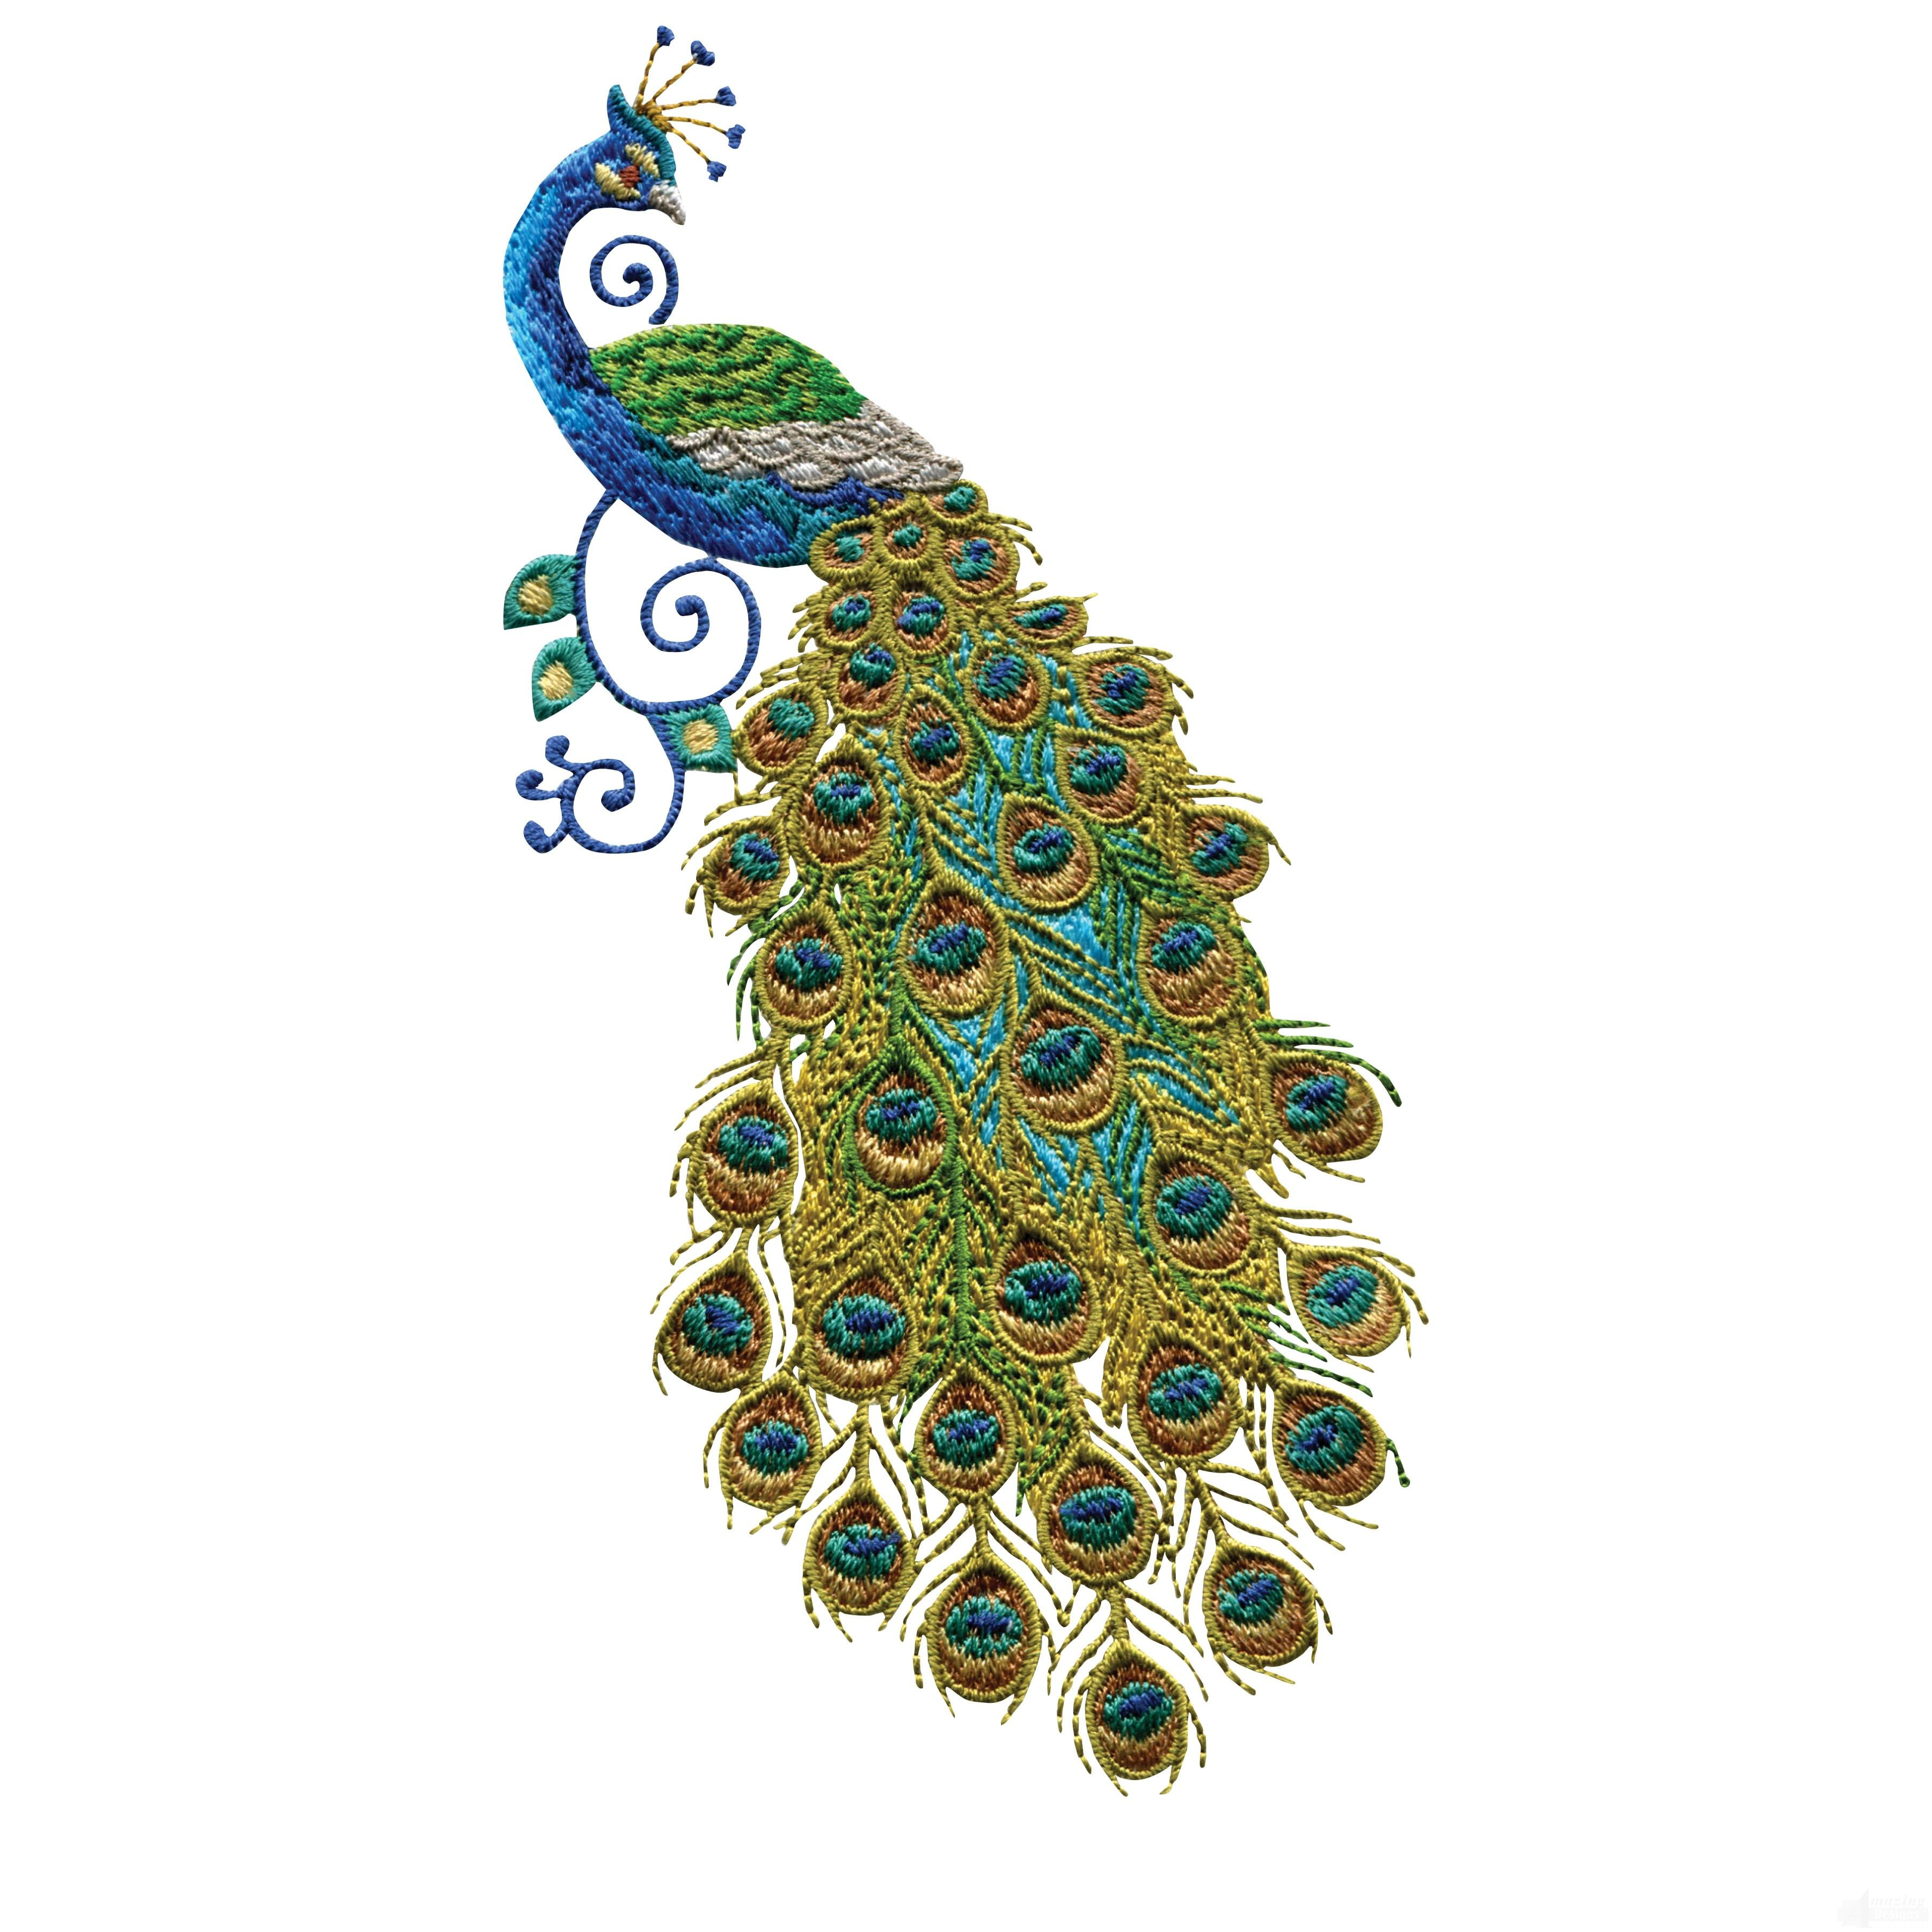 Swnpa128 Peacock Embroidery Design | Needles U0026 Hooks | Pinterest | Embroidery Designs Peacocks ...